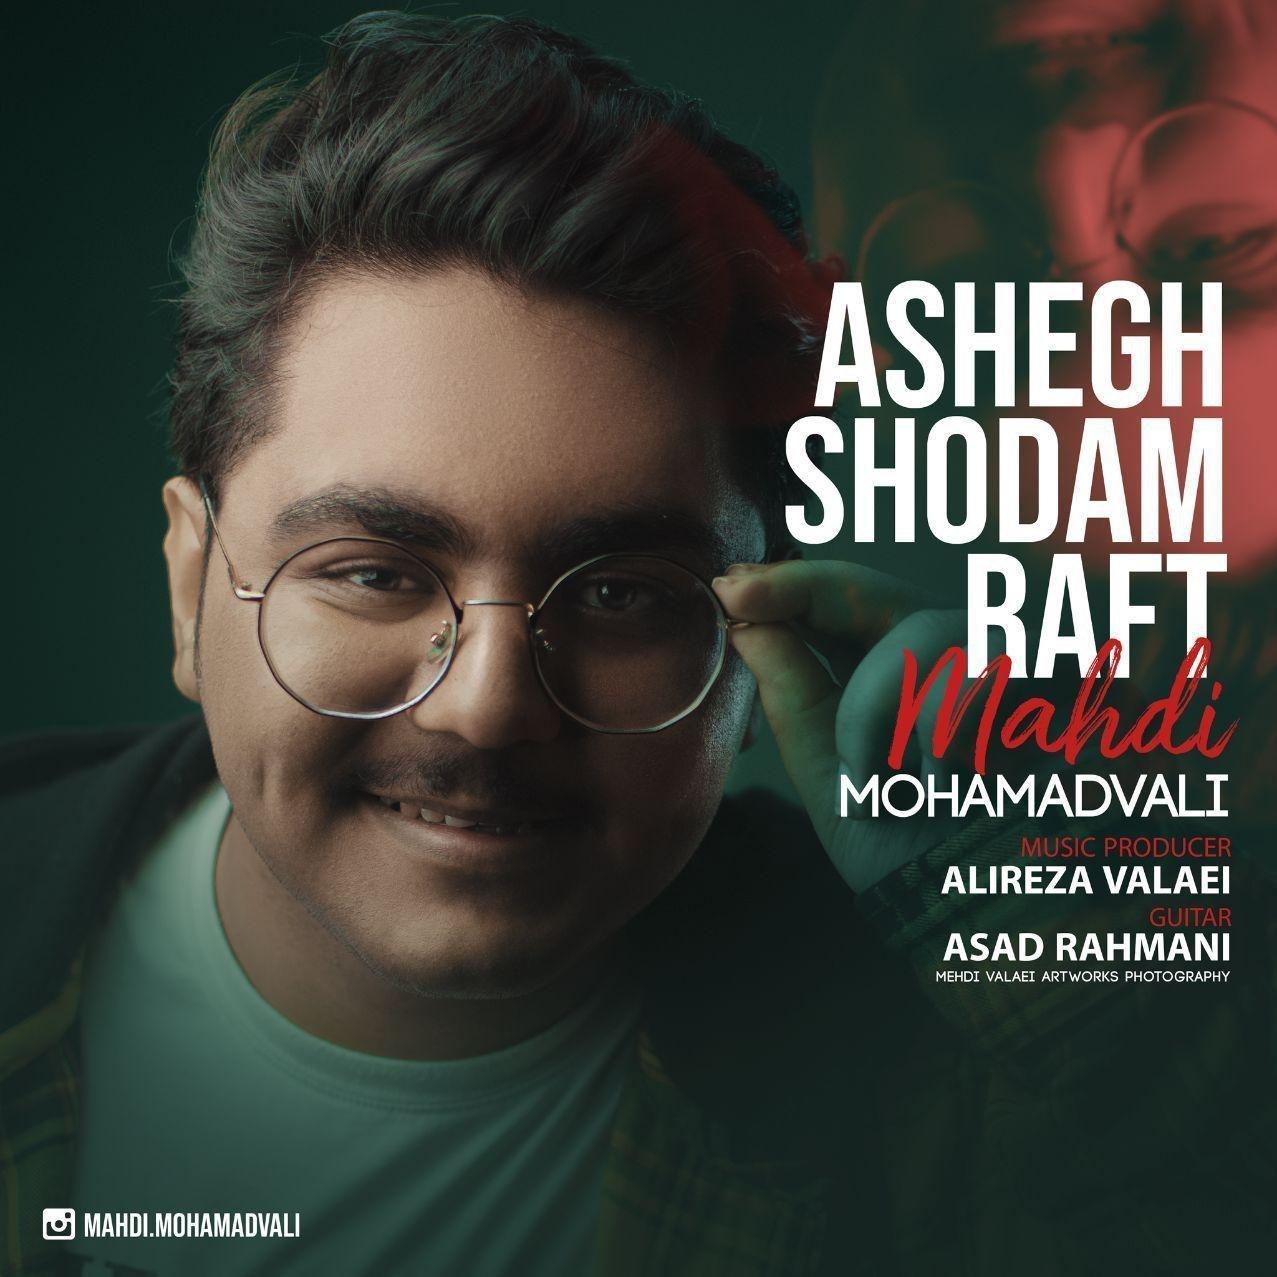 Mahdi Mohamadvali – Ashegh Shodam Raft